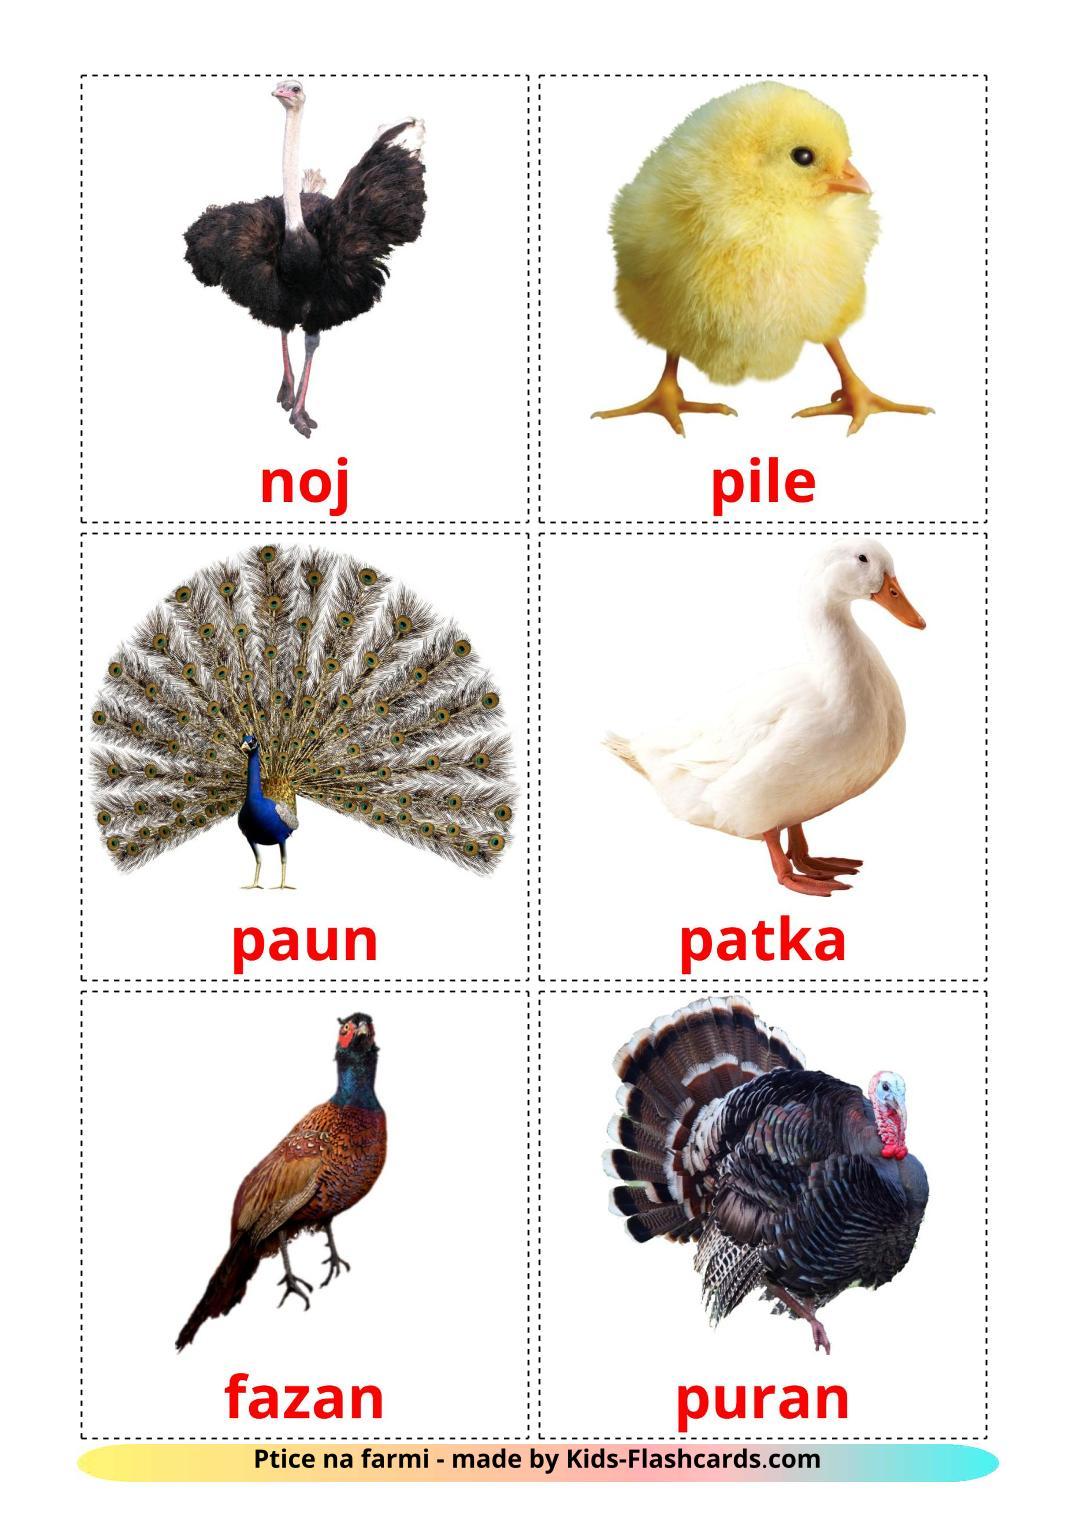 Farm birds - 11 Free Printable croatian Flashcards